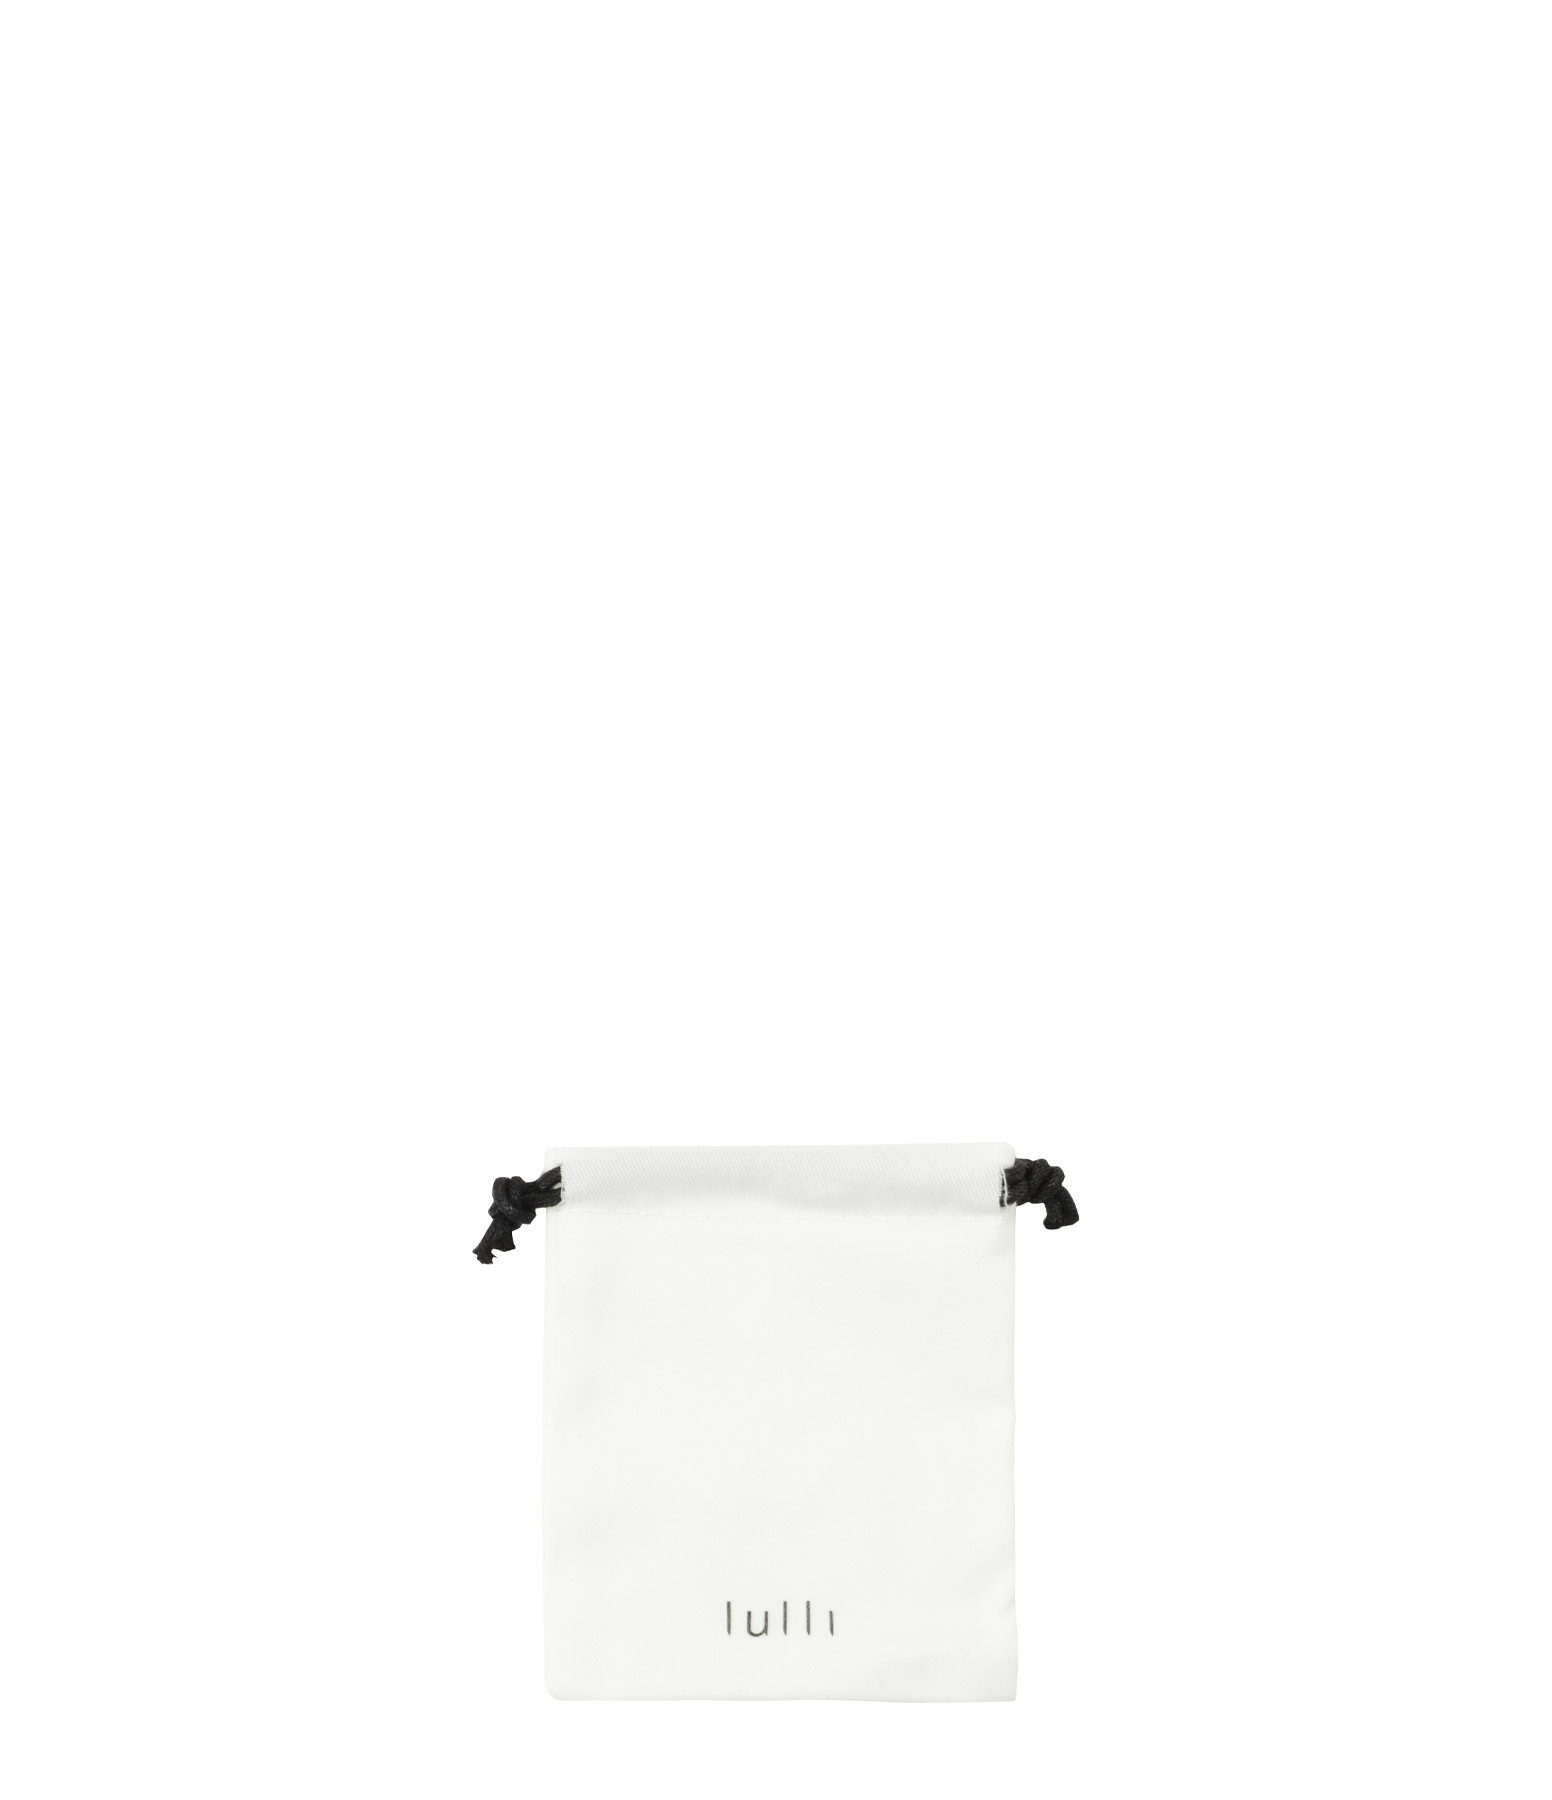 LULLI - Pochette Coton 10x12cm Imprimé Lulli